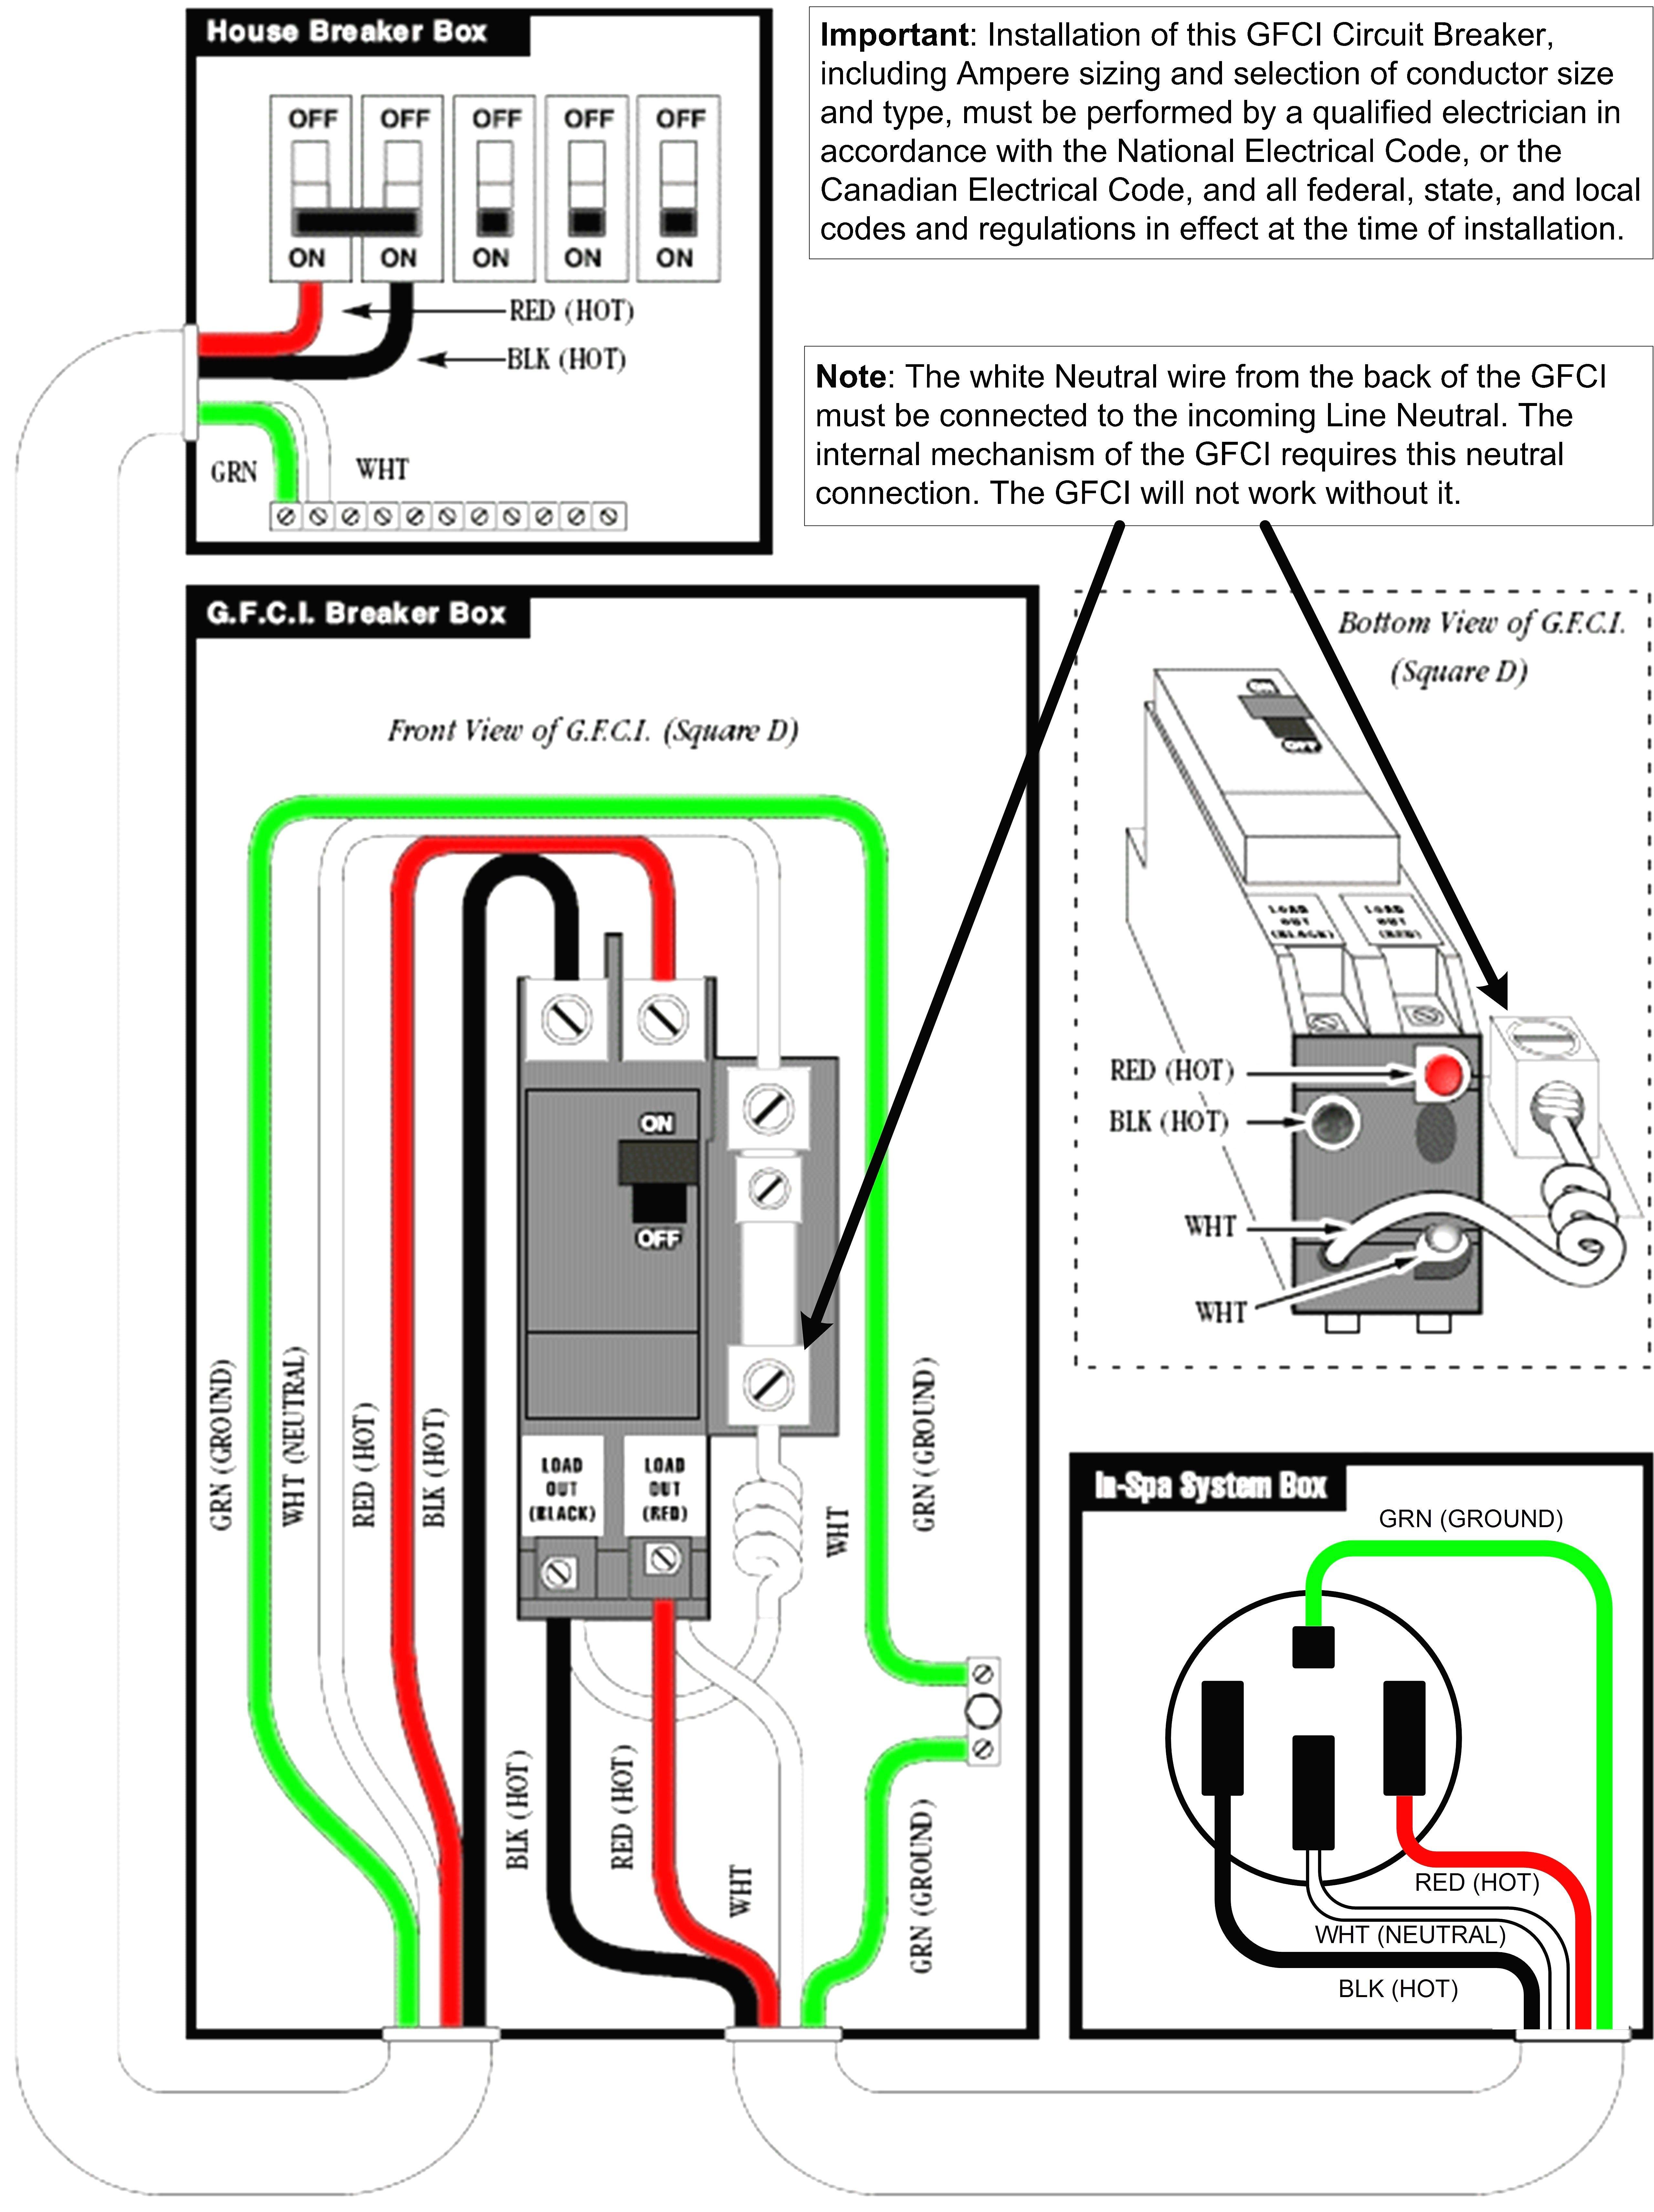 medium resolution of new gfci wiring diagram for hot tub diagram diagramsample diagramtemplate wiringdiagram